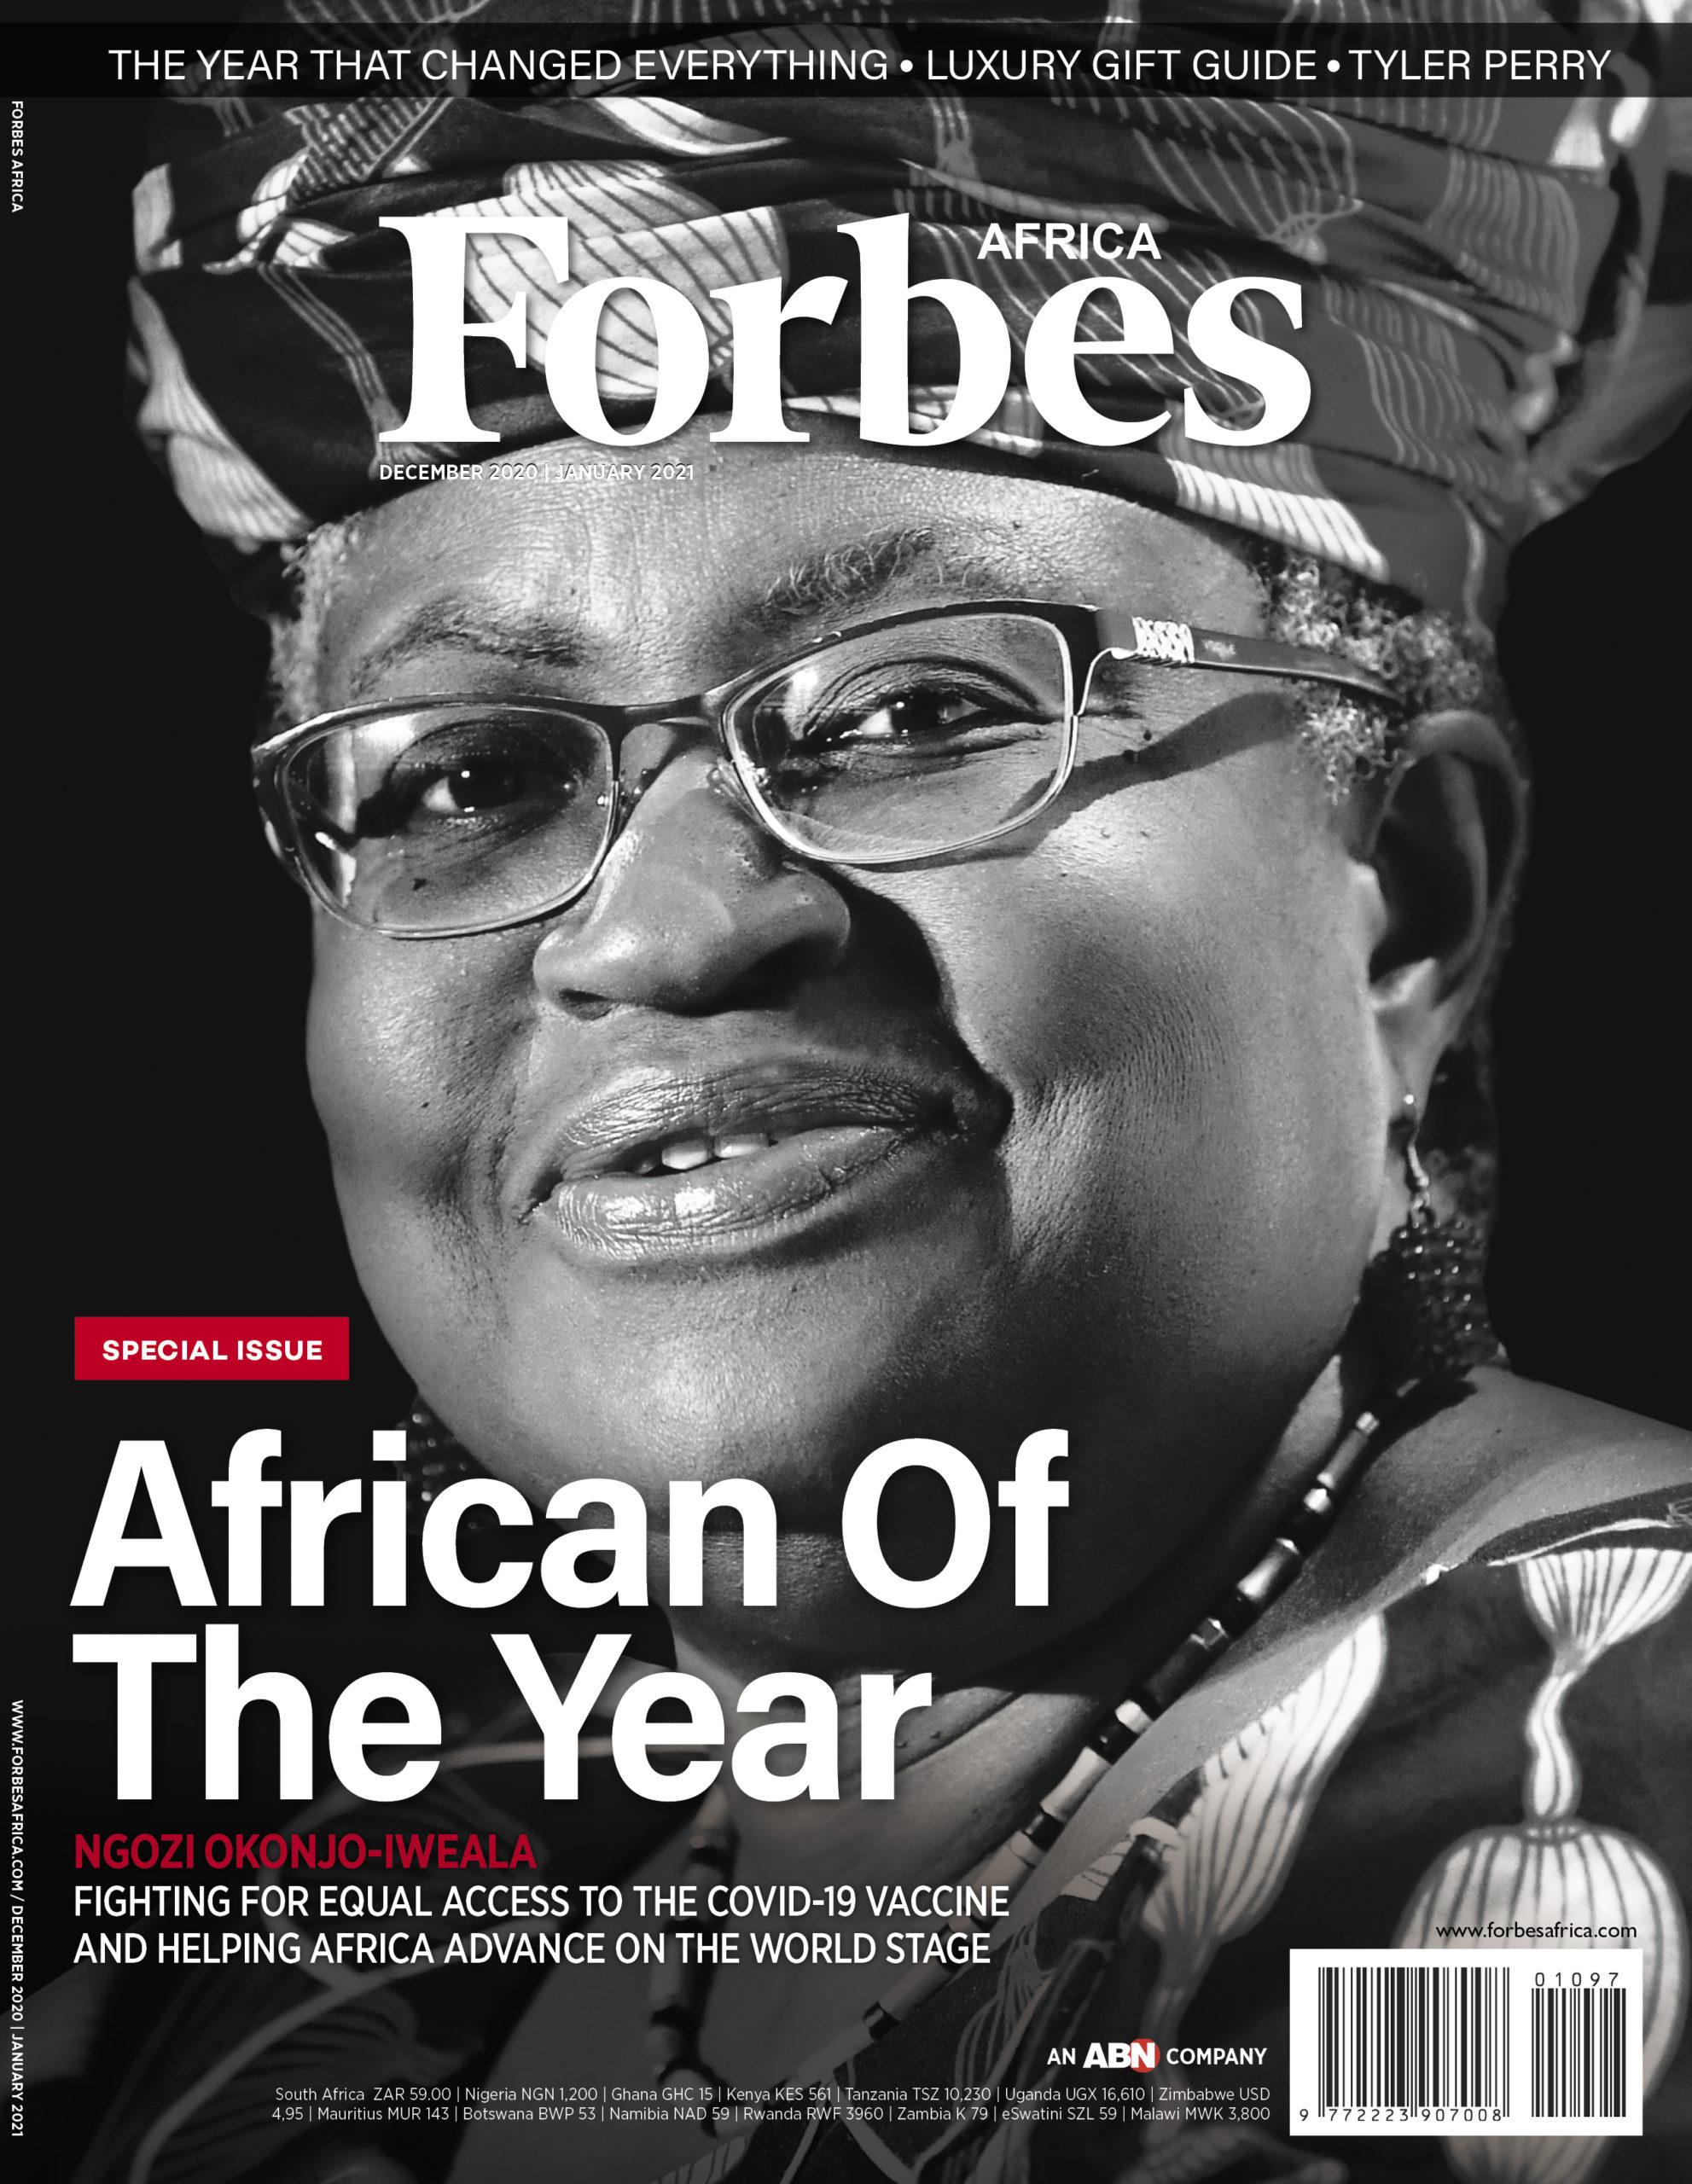 Nigerian Dr Okonjo-Iweala is Forbes African of The Year